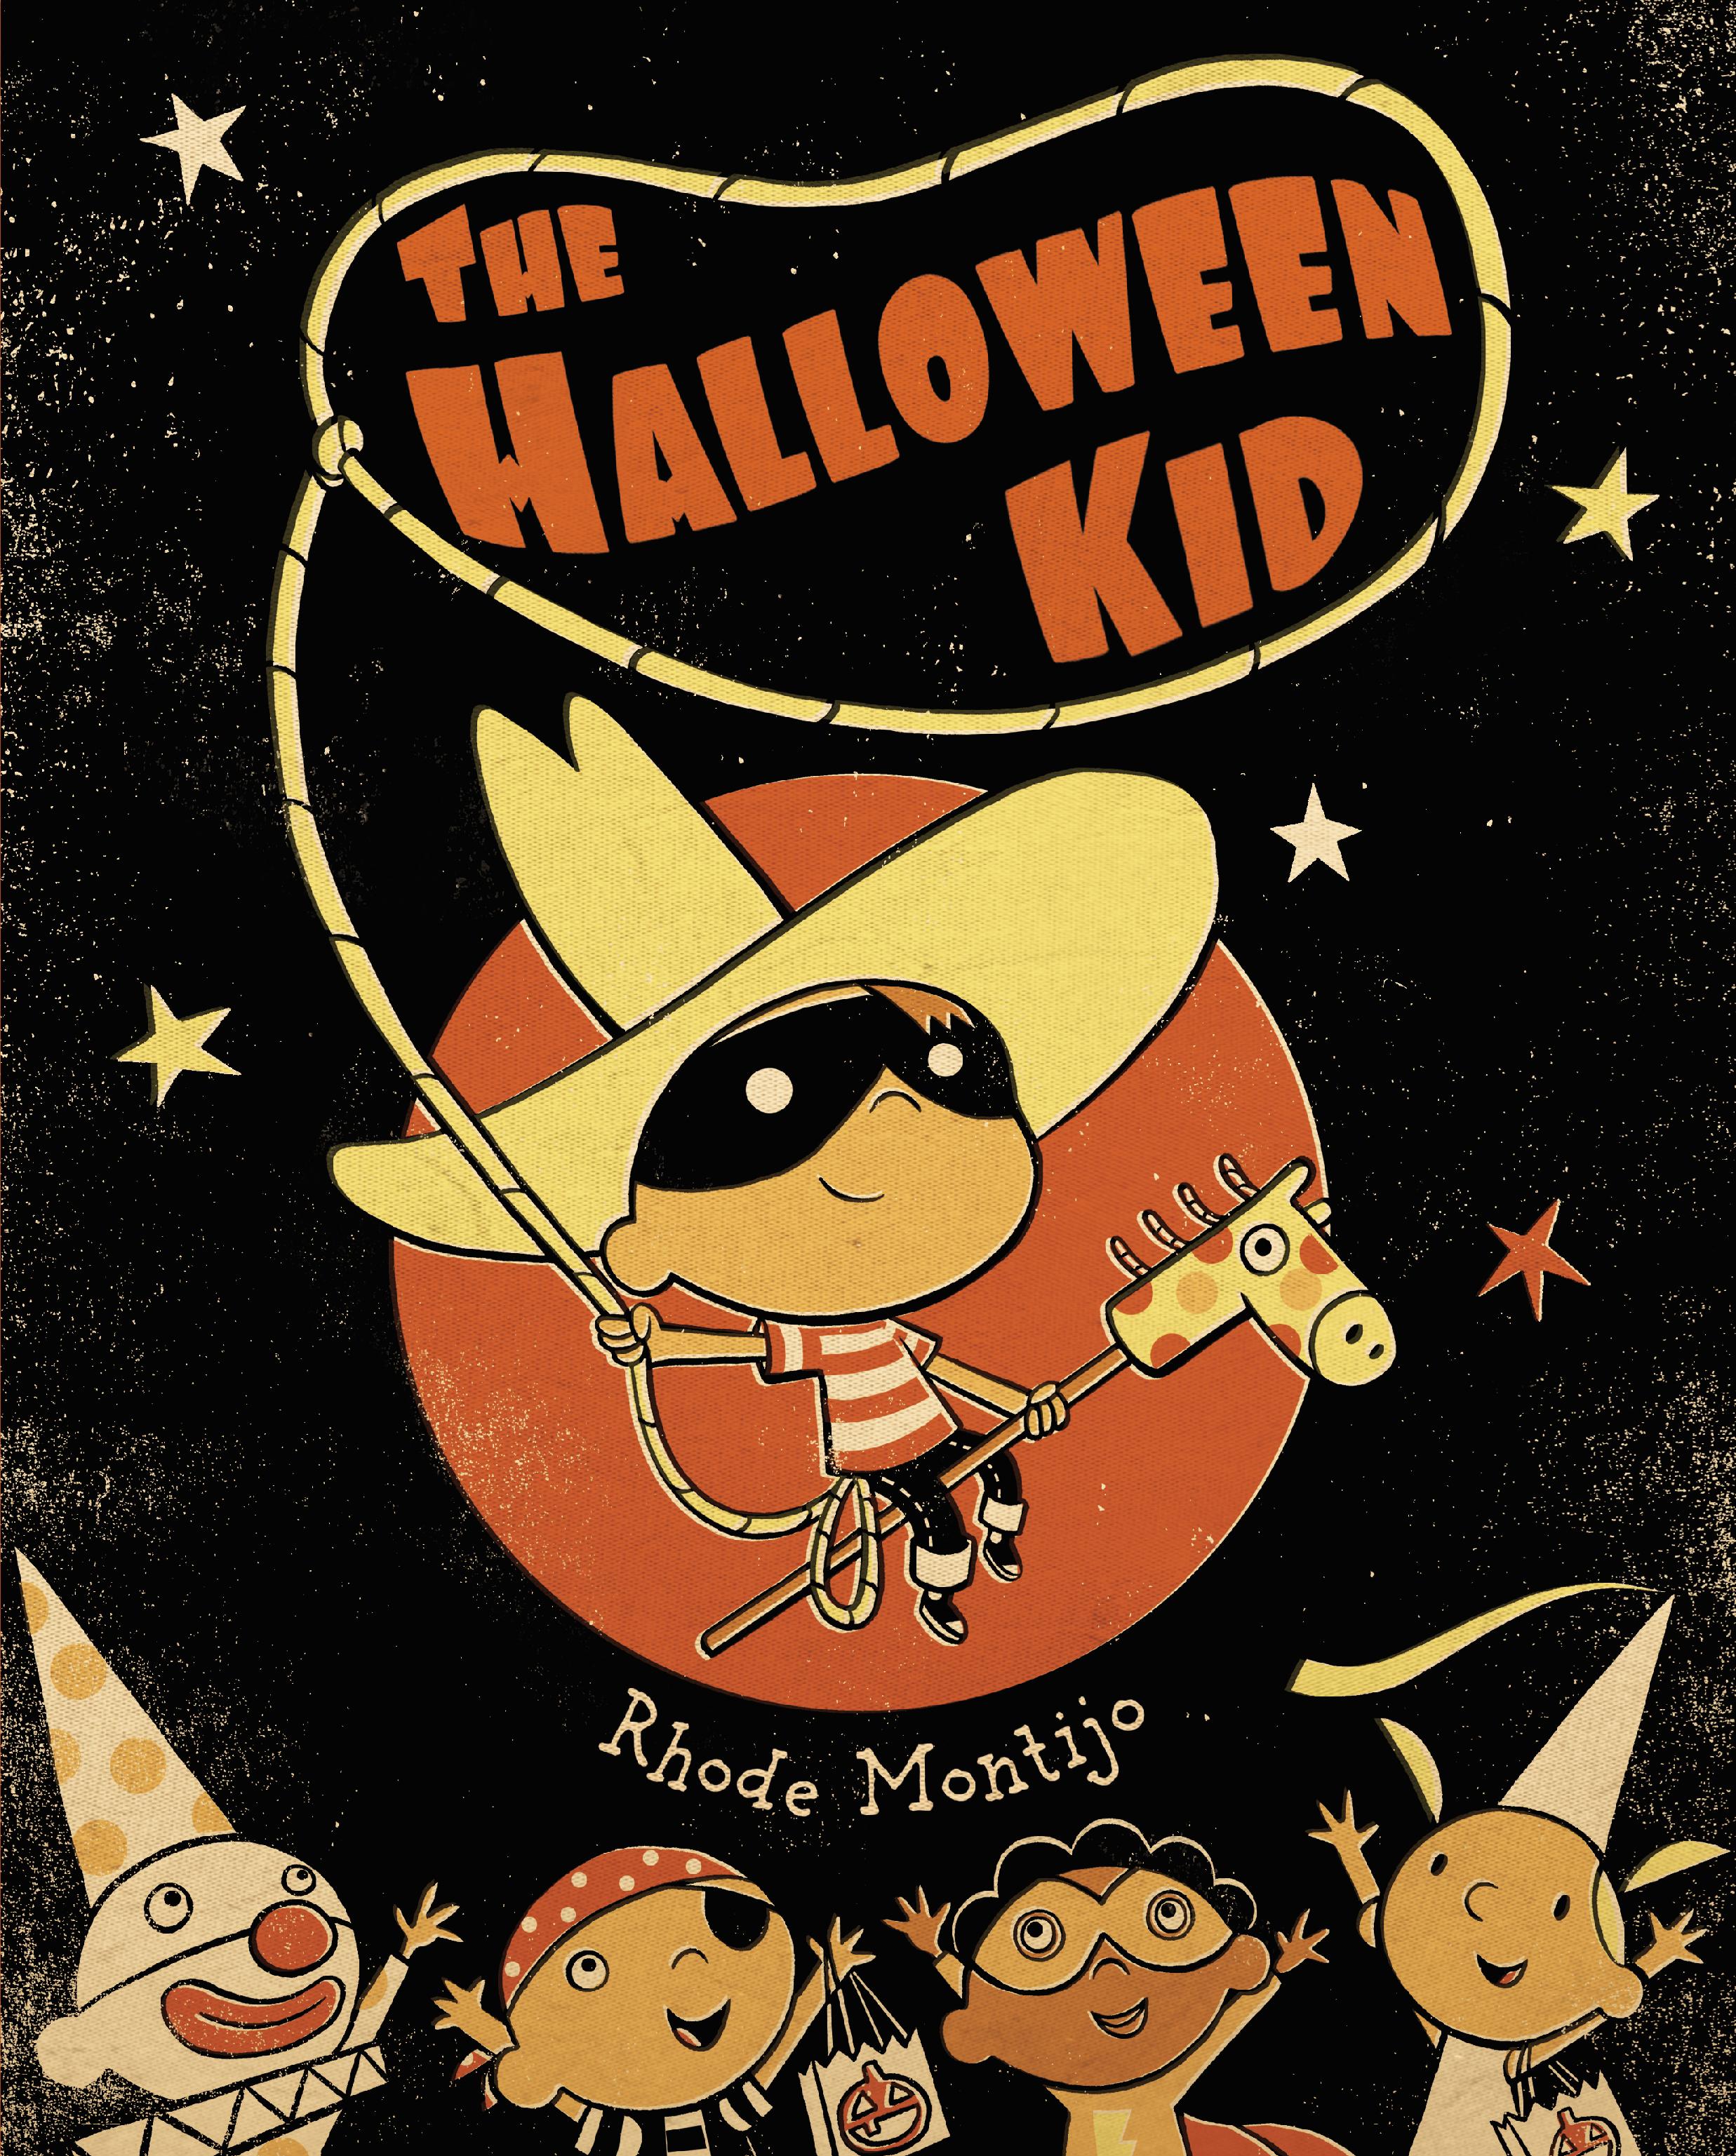 cvr9781416935759 9781416935759 hr the halloween